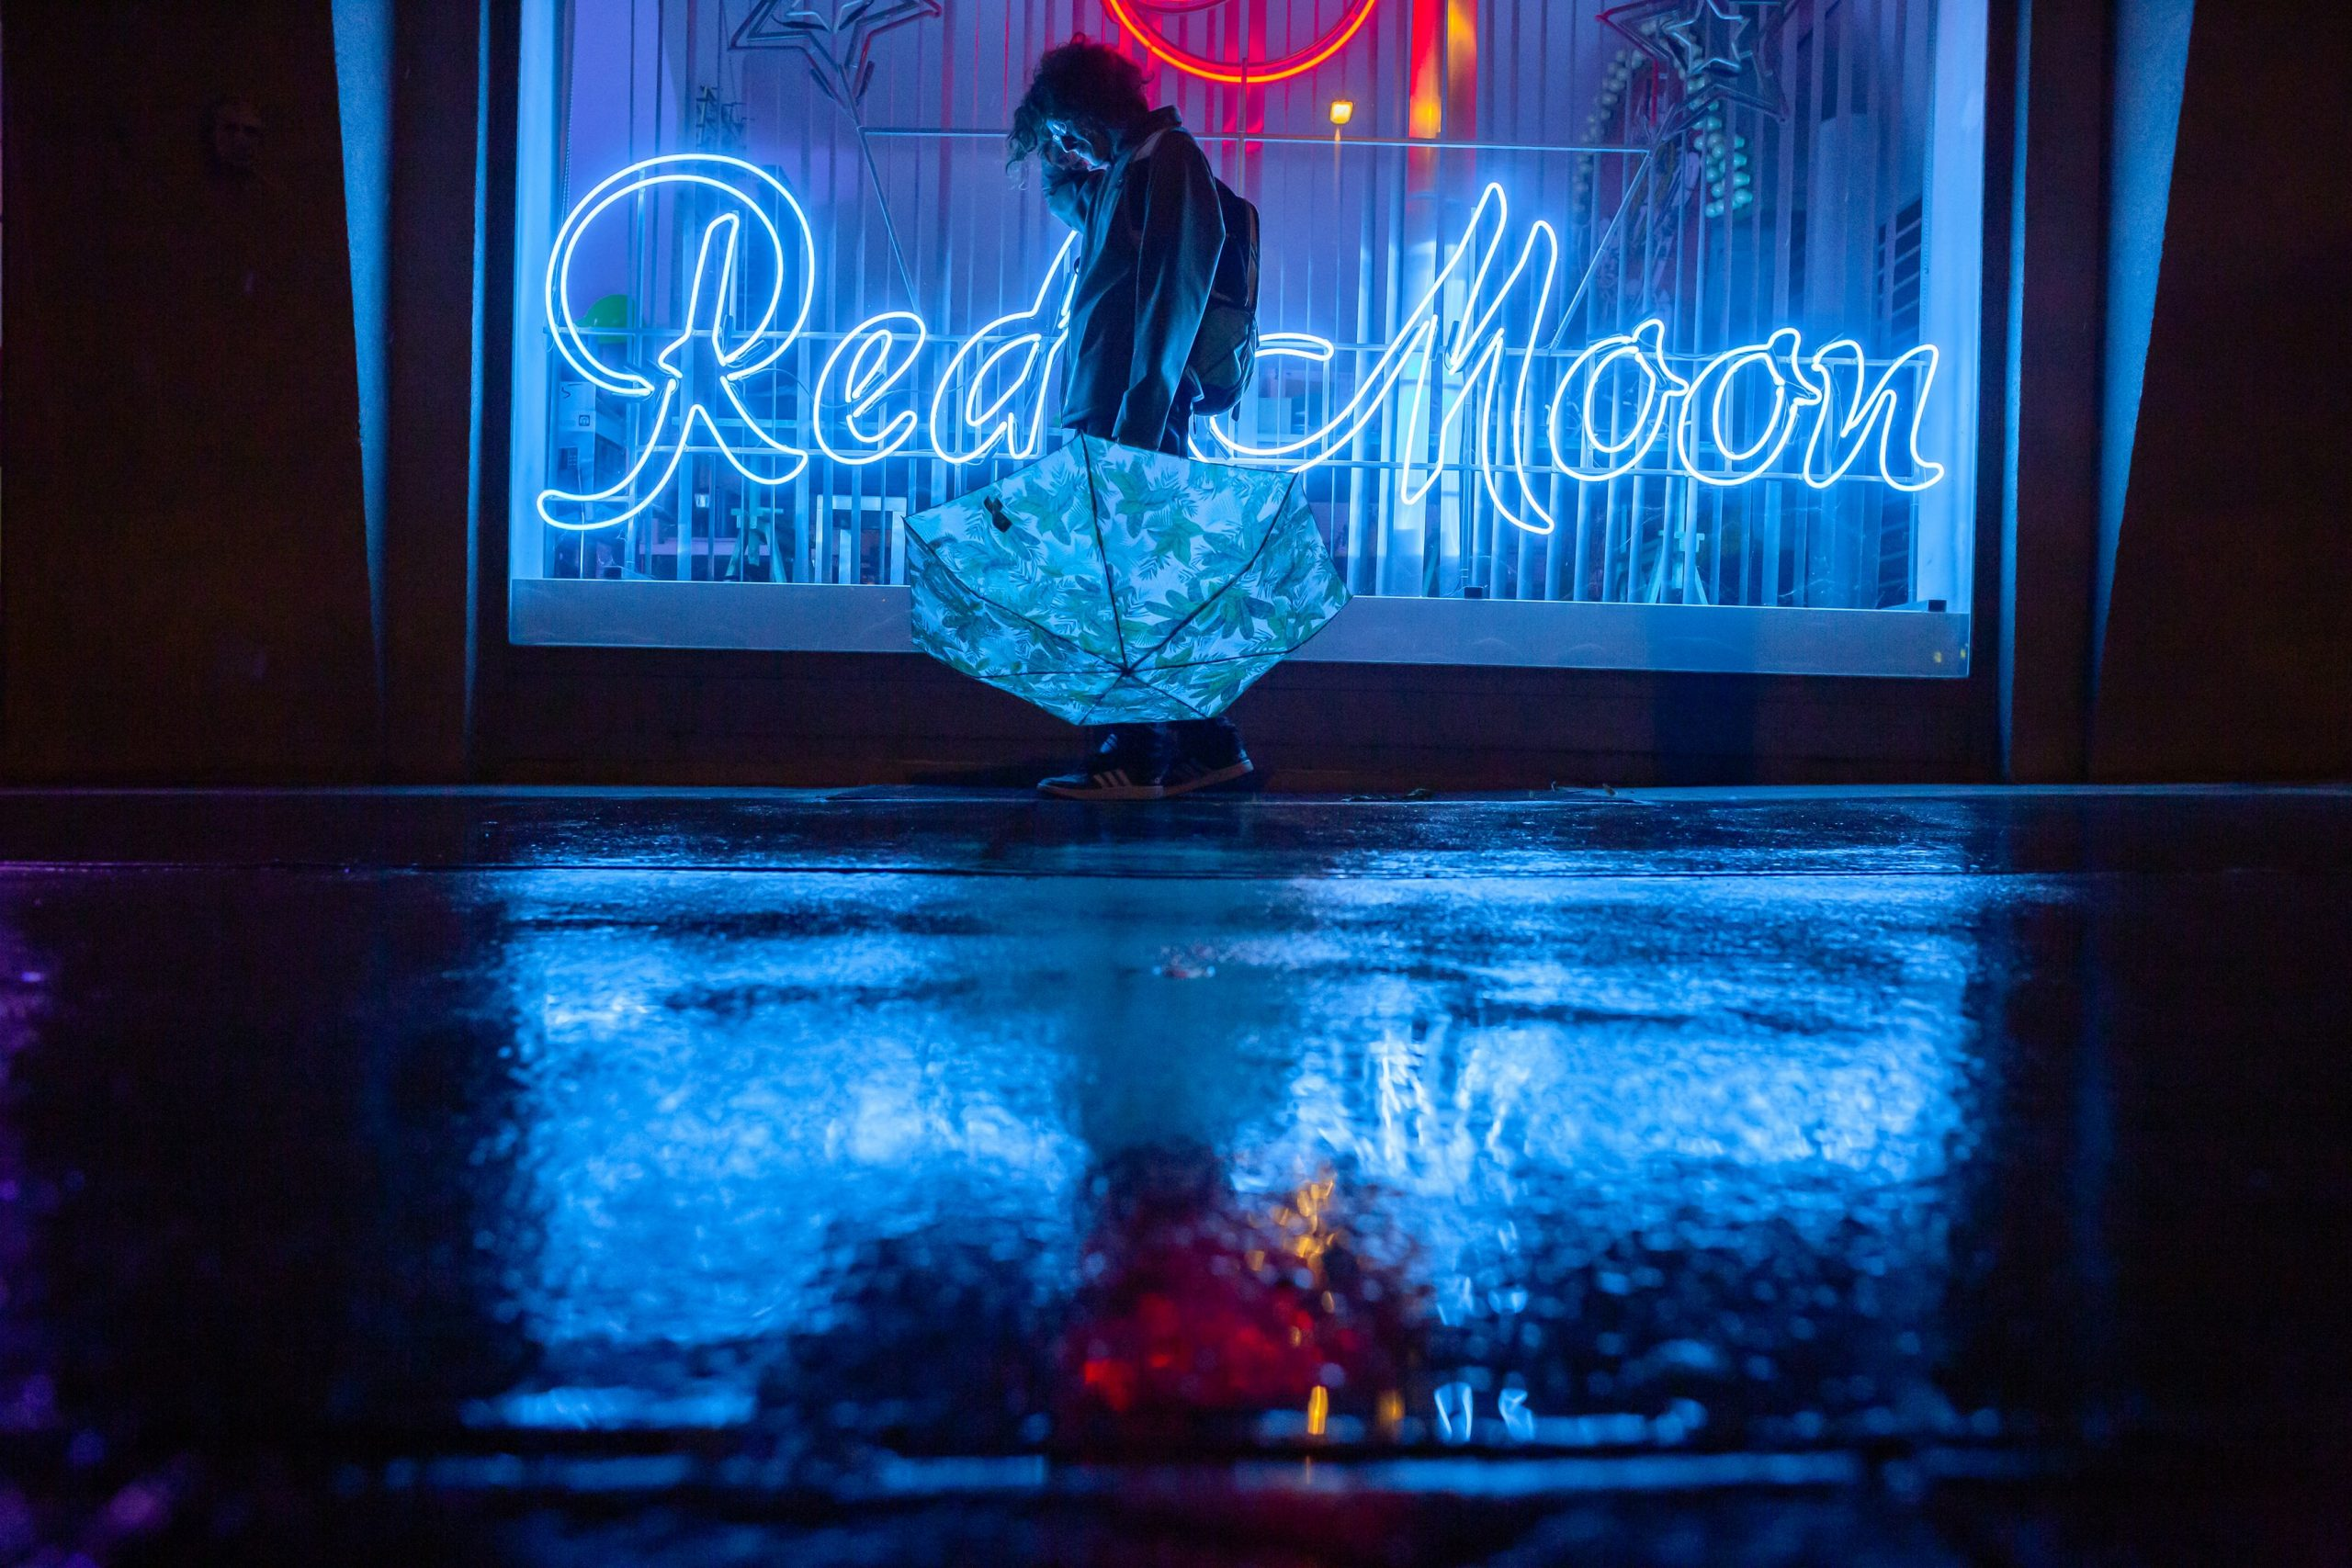 Portrait nightshooting_lifestyle_rain Photography_Christina Hein